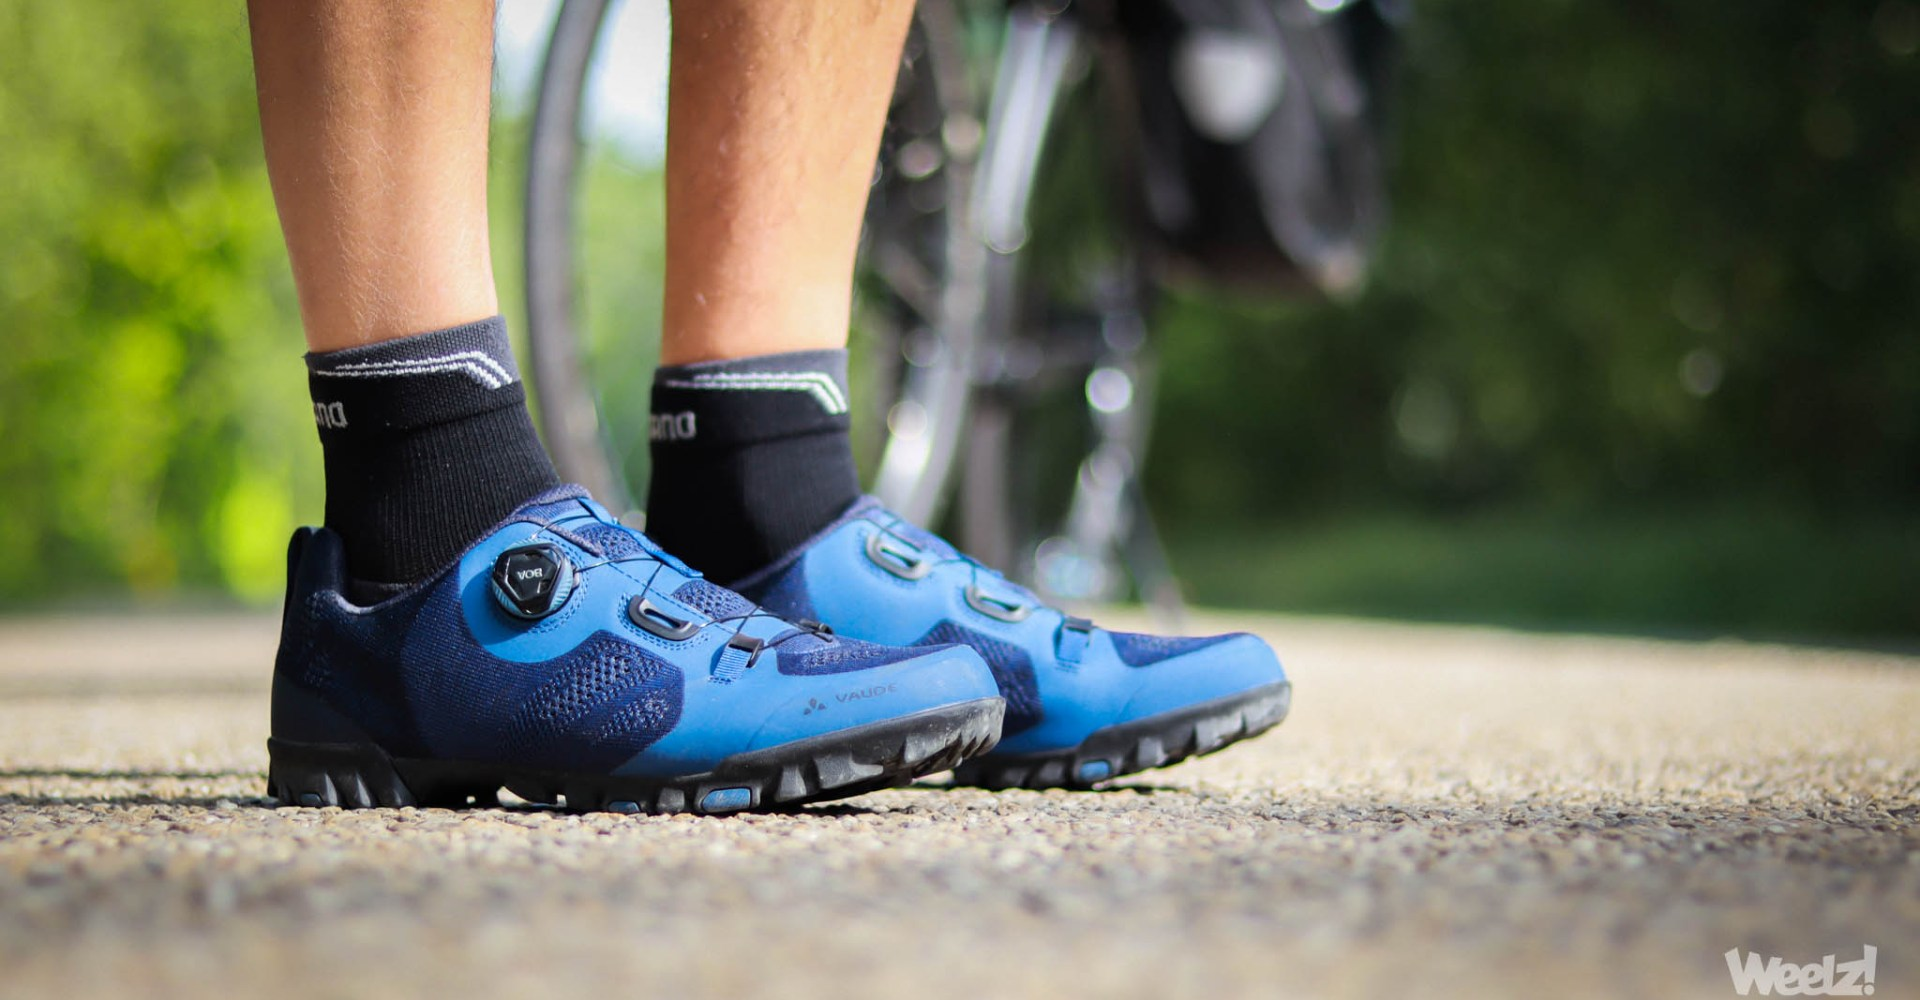 [Test] Chaussures Vaude TVL Skoj, confort tricoté